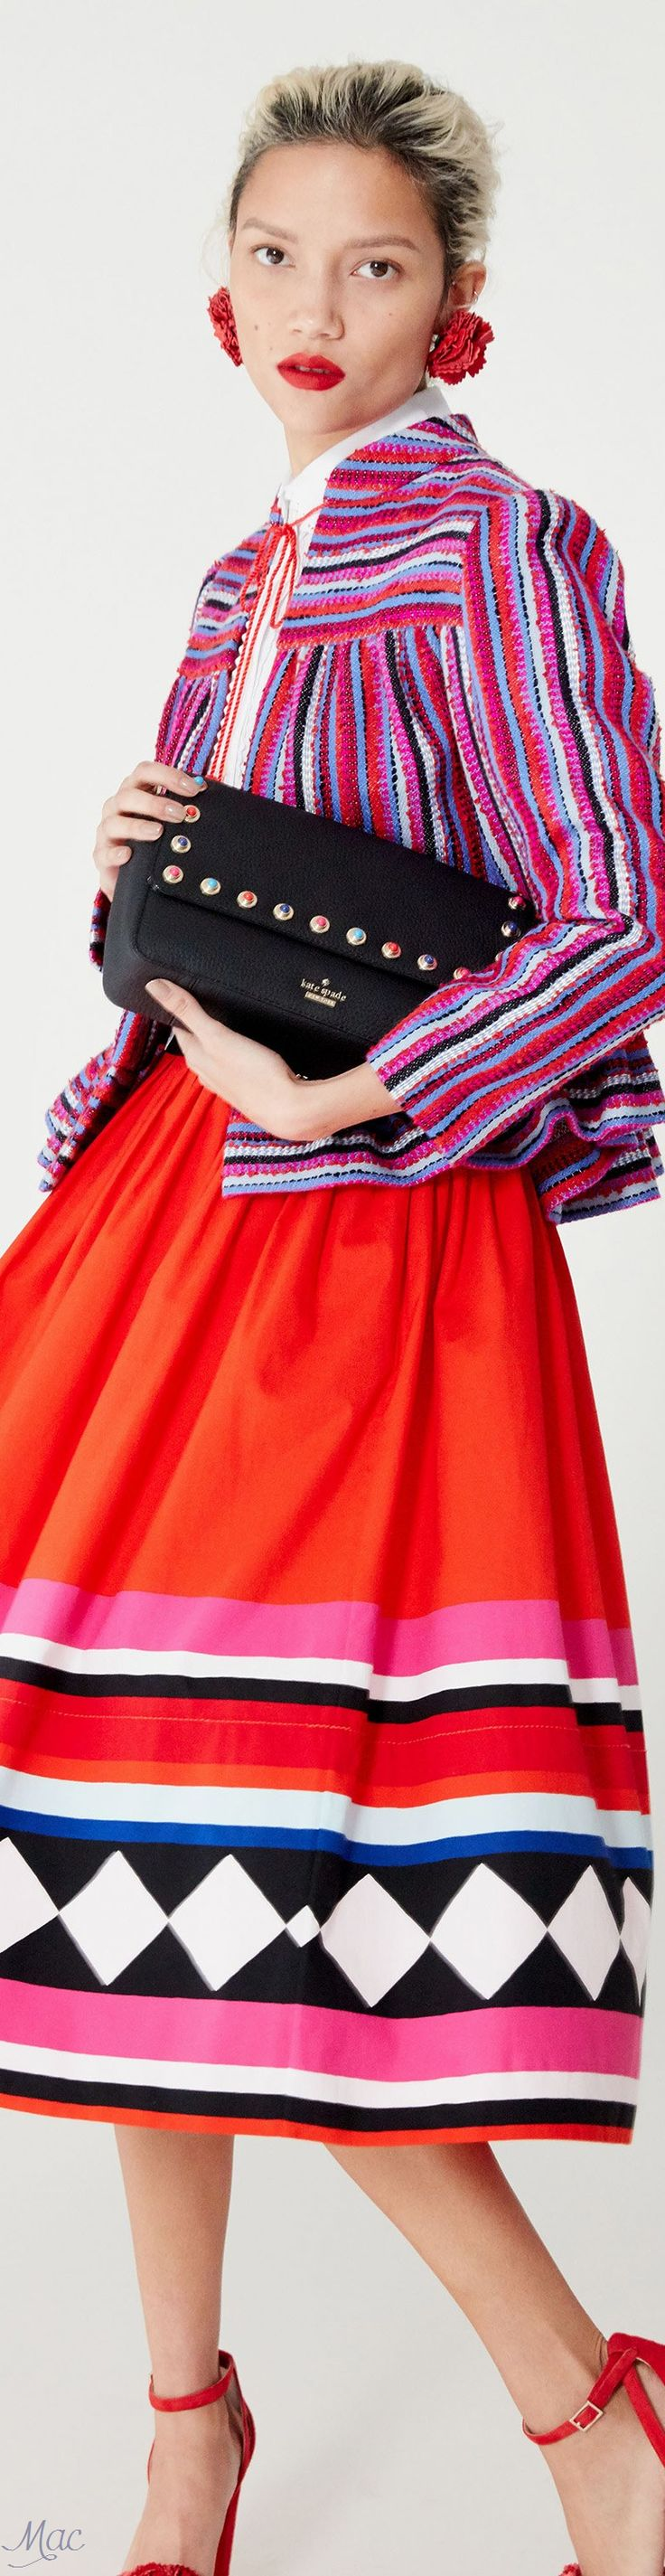 best louisa spagnoli images on pinterest clothes louisa